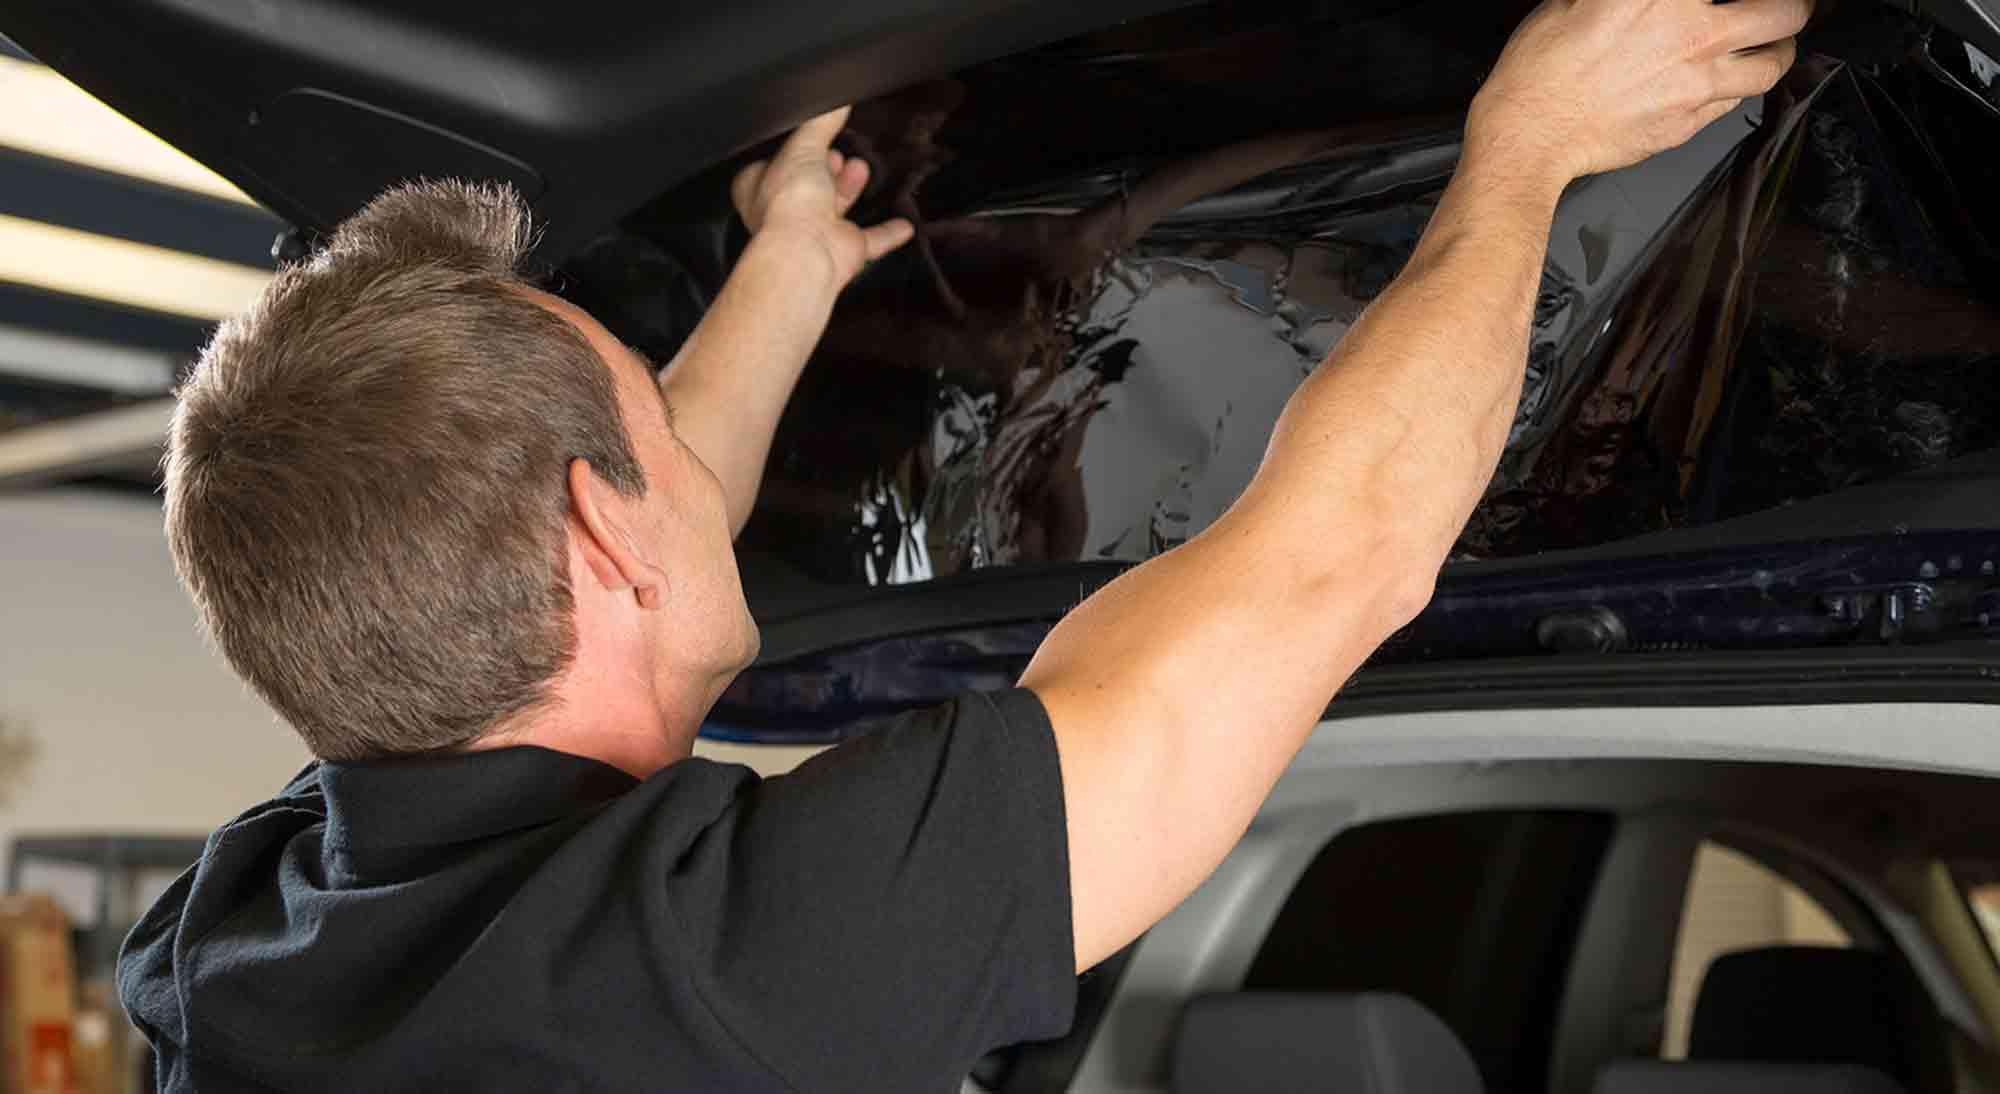 install rayno window film on cars